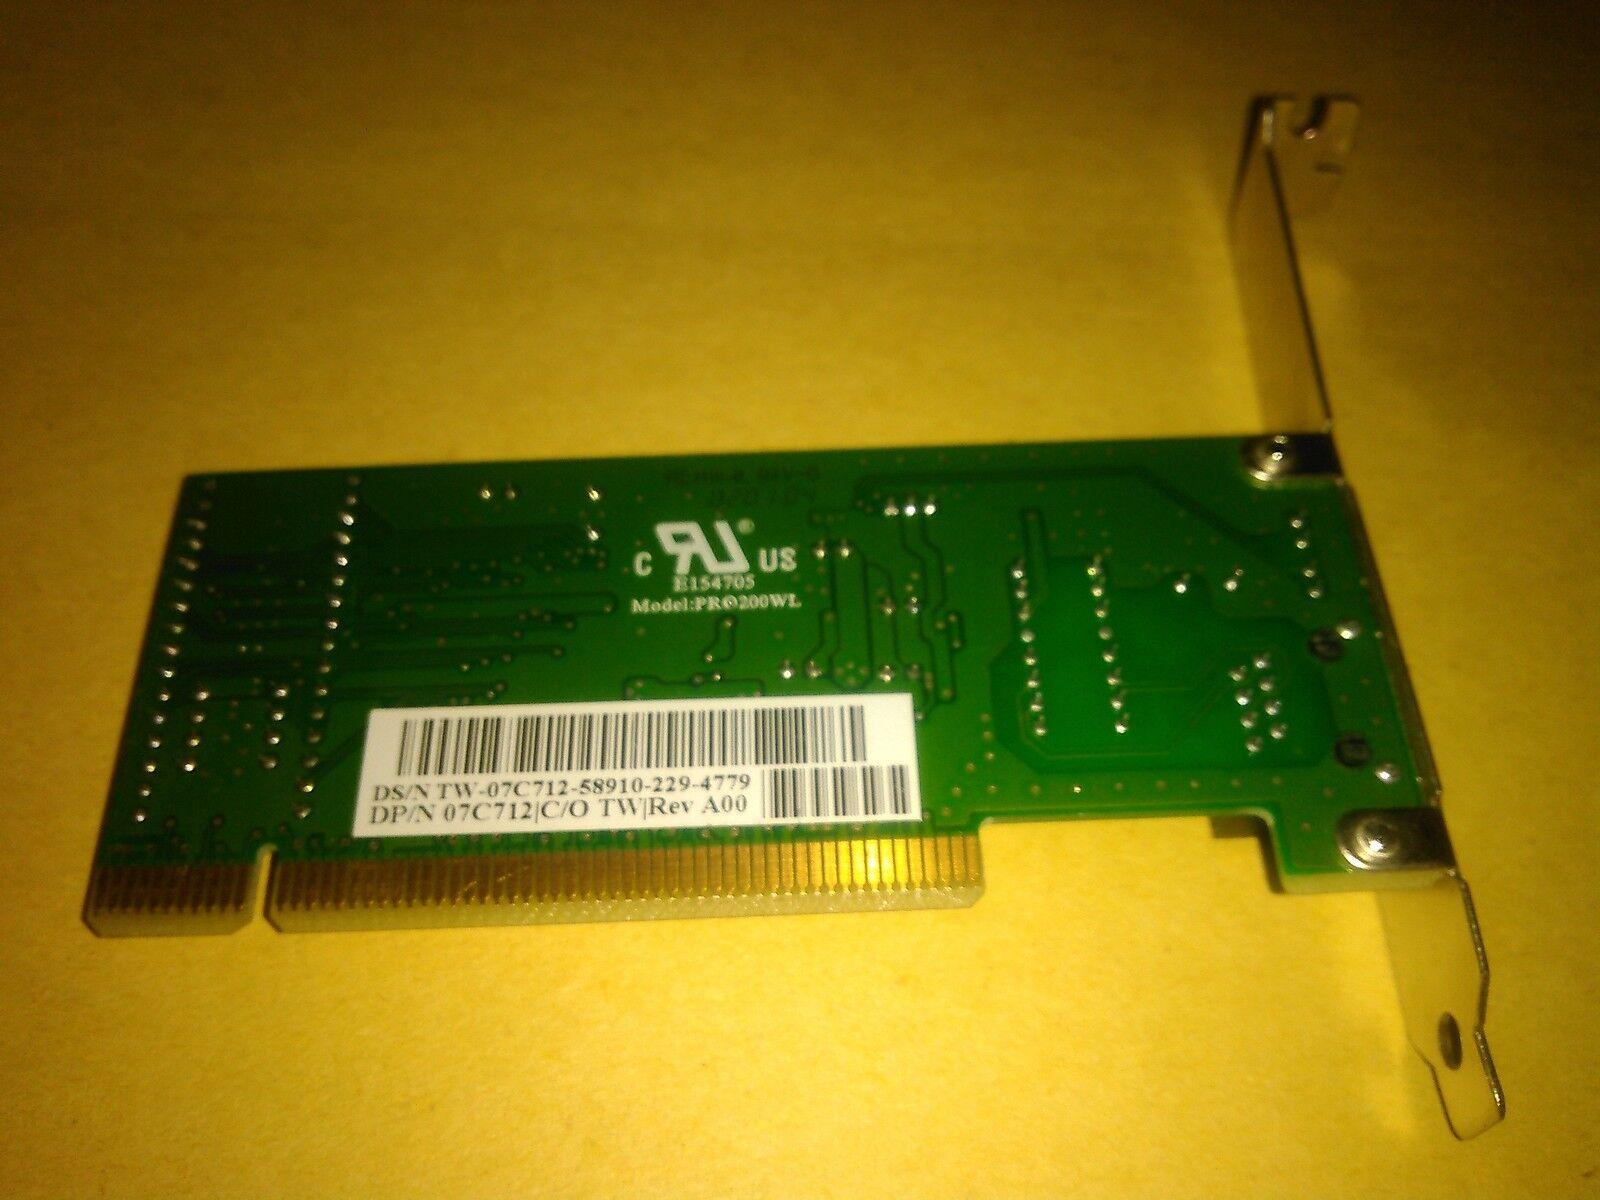 DAVICOM 9102 BASED PCI FAST ETHERNET DRIVERS FOR WINDOWS